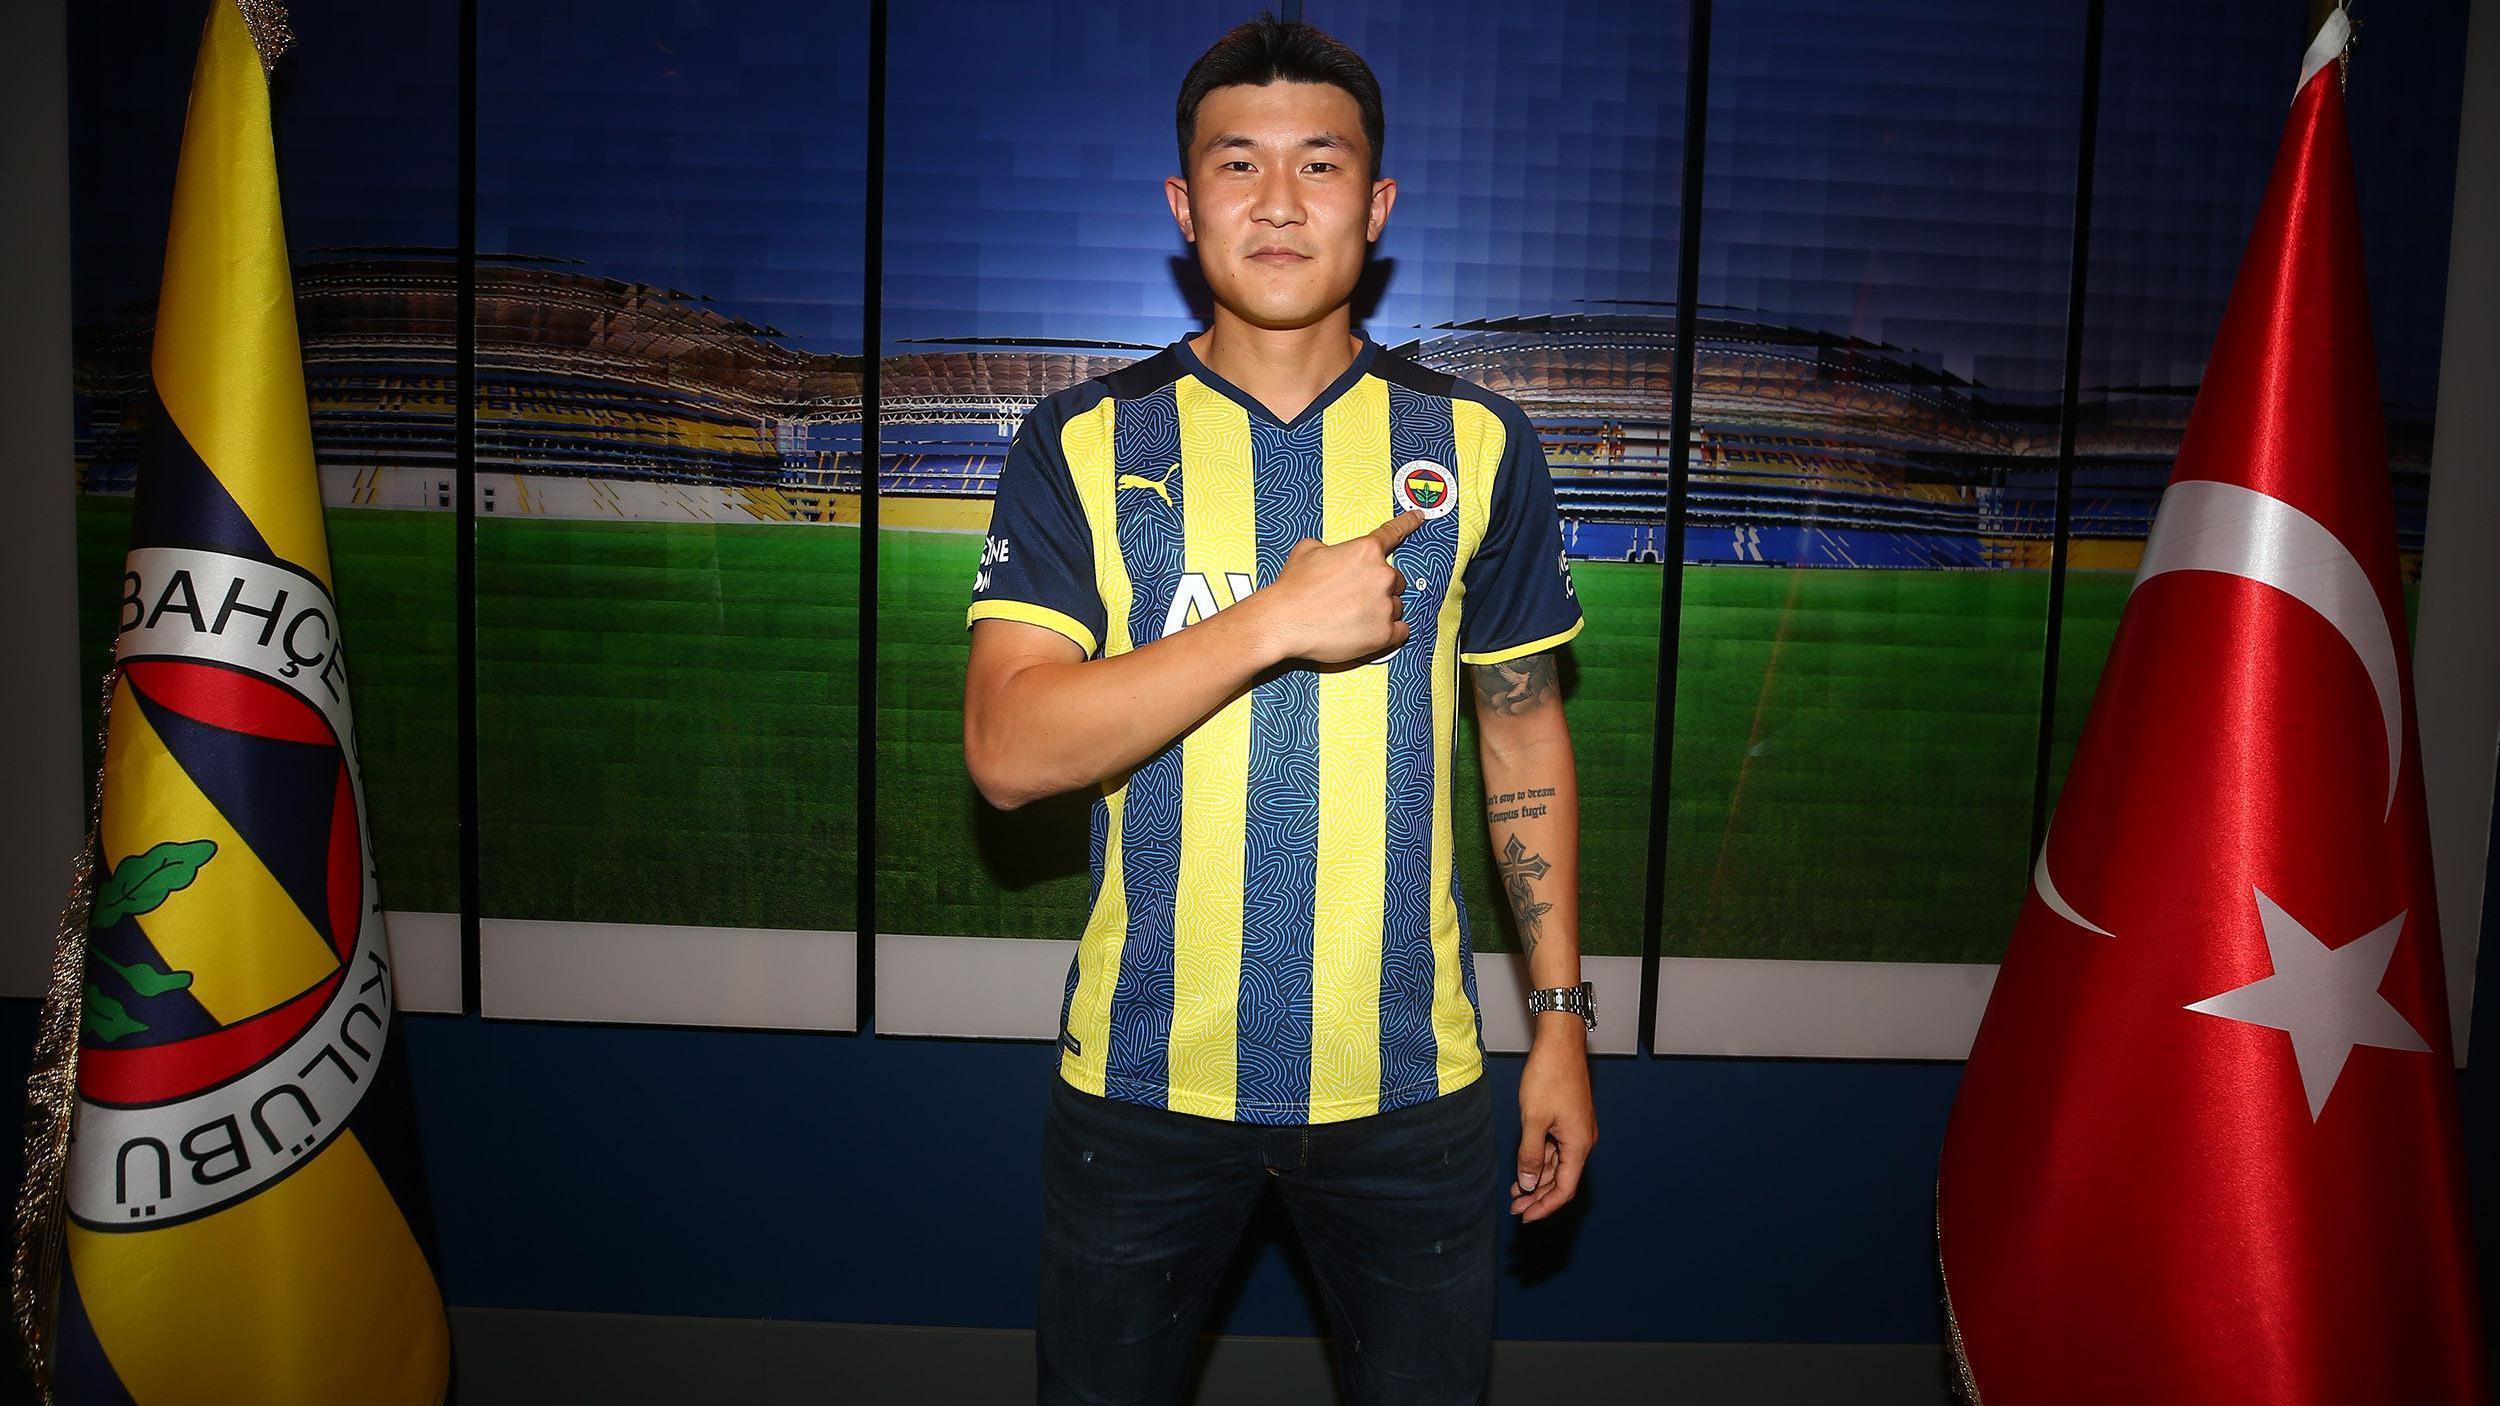 Fenerbahçede Min Jae-Kim, Adana Demirspor karşısında 11de